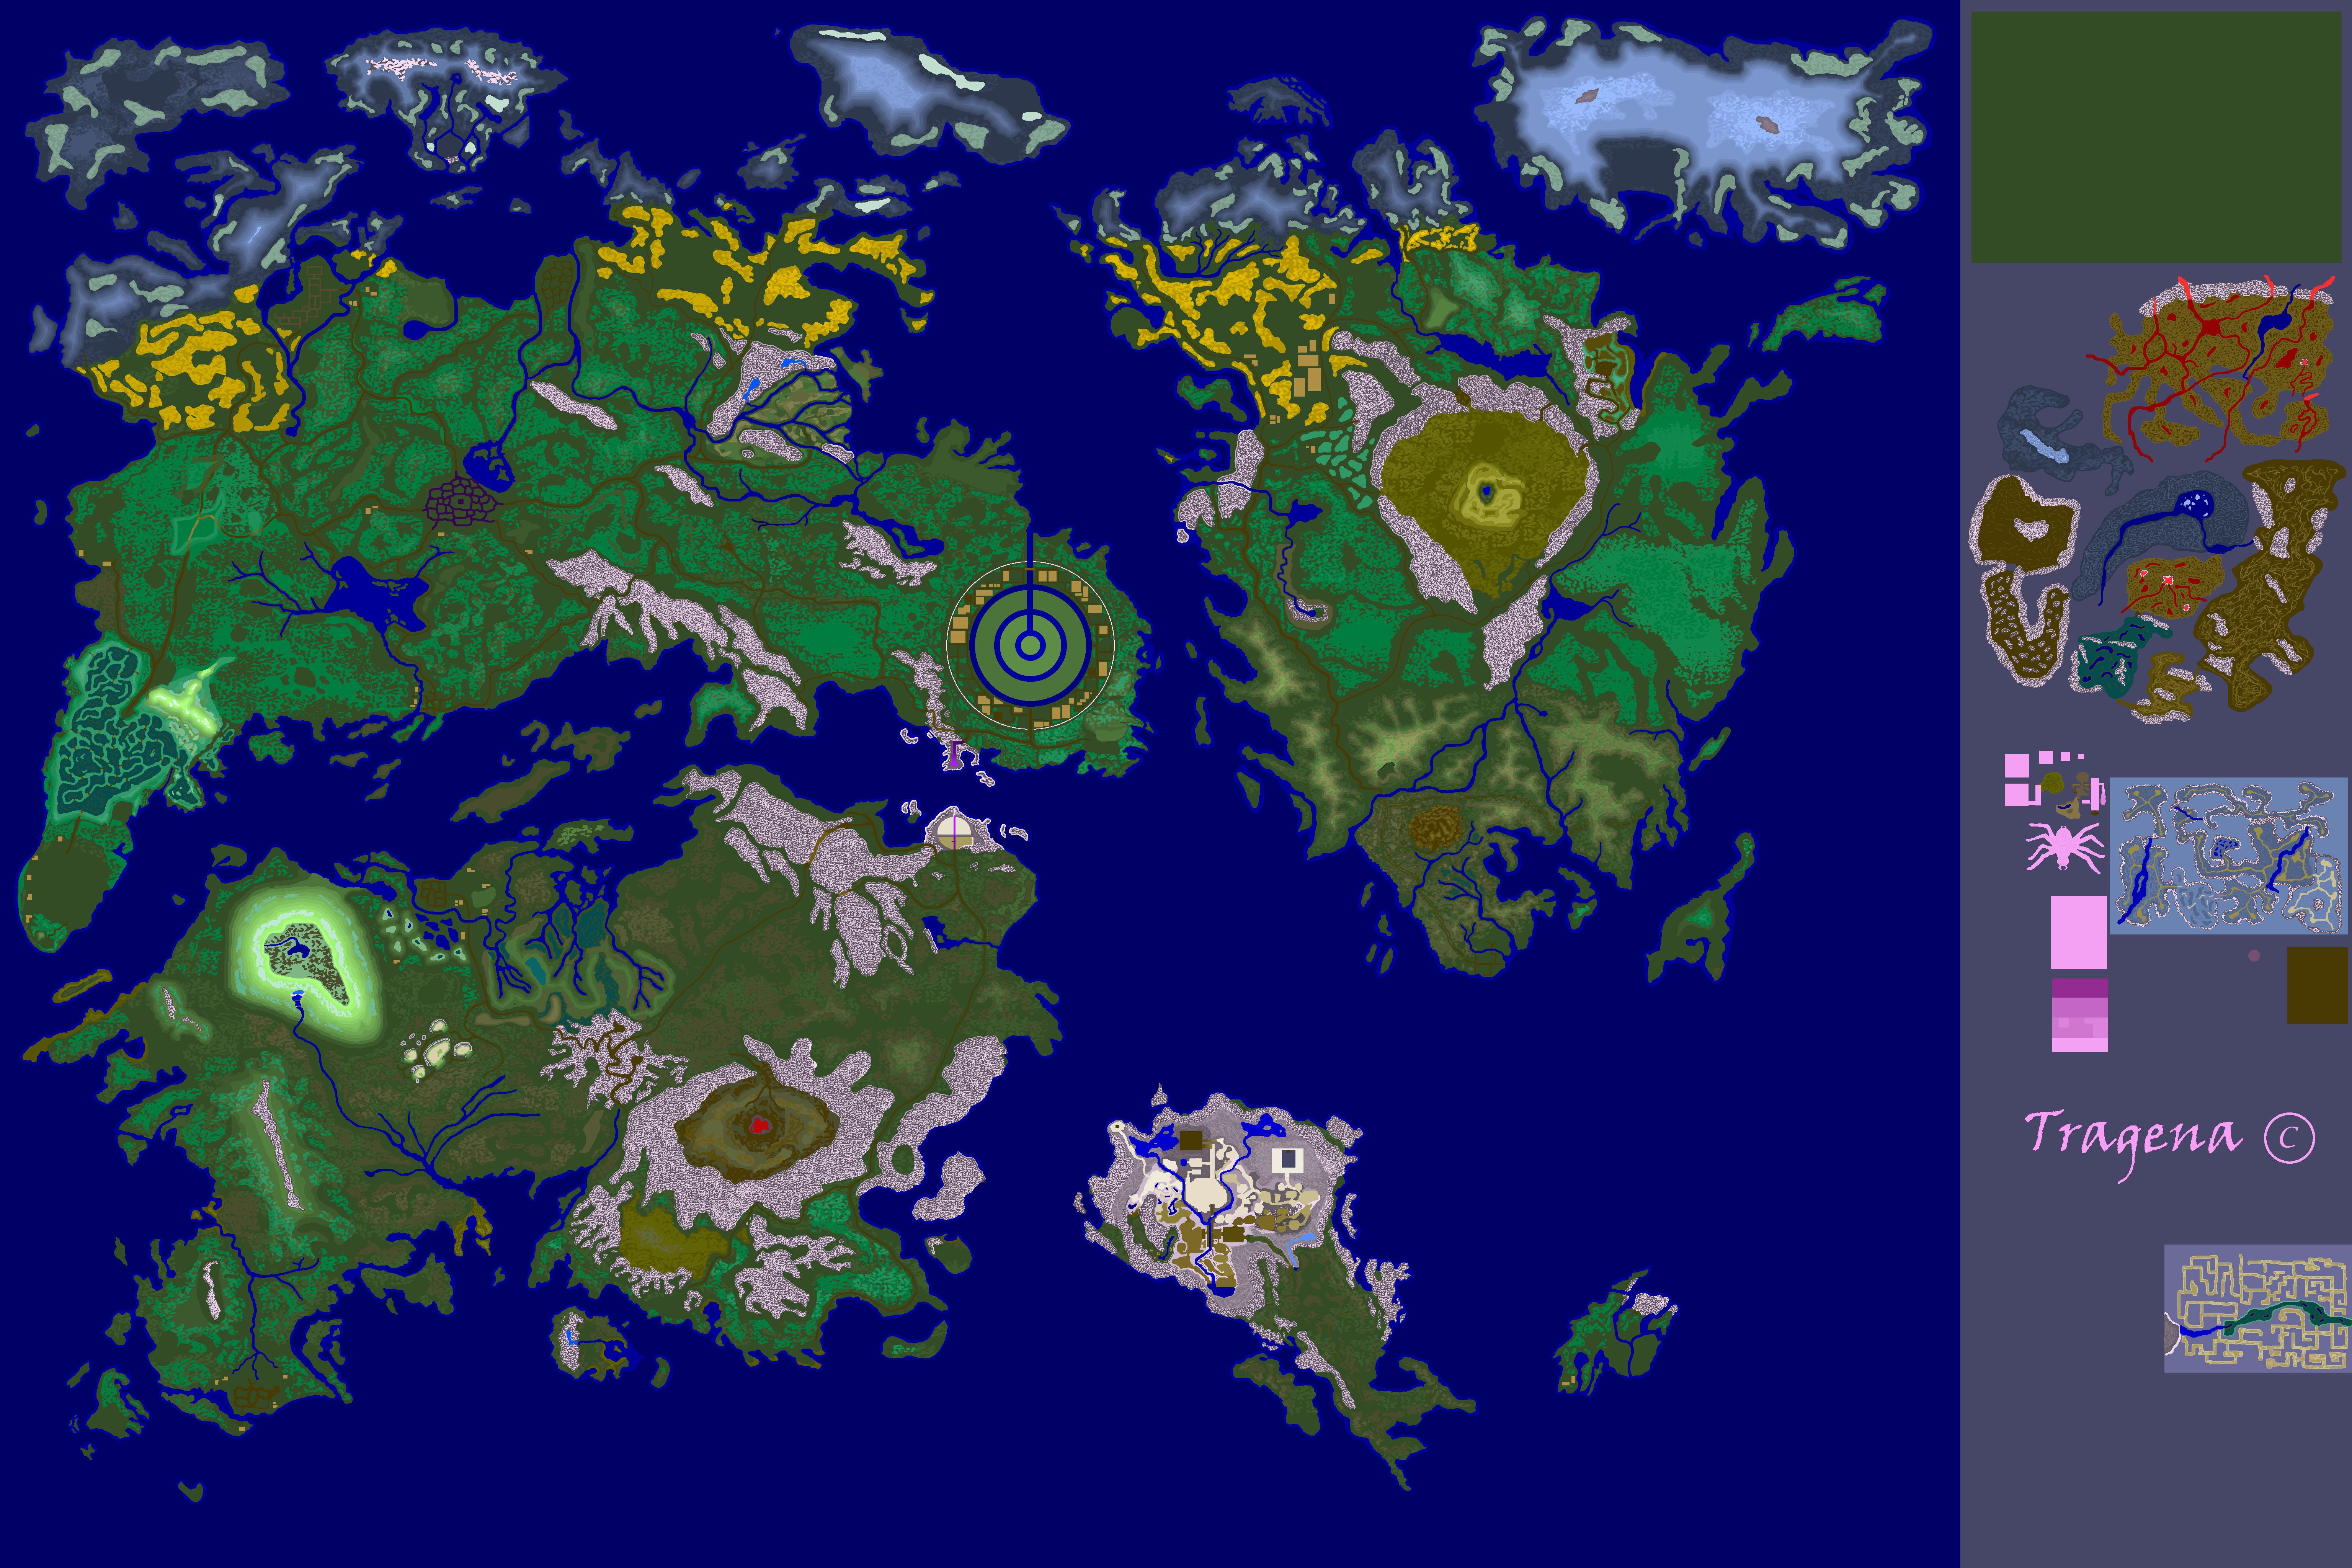 Ultima Online, Tragena free Shard Art Work